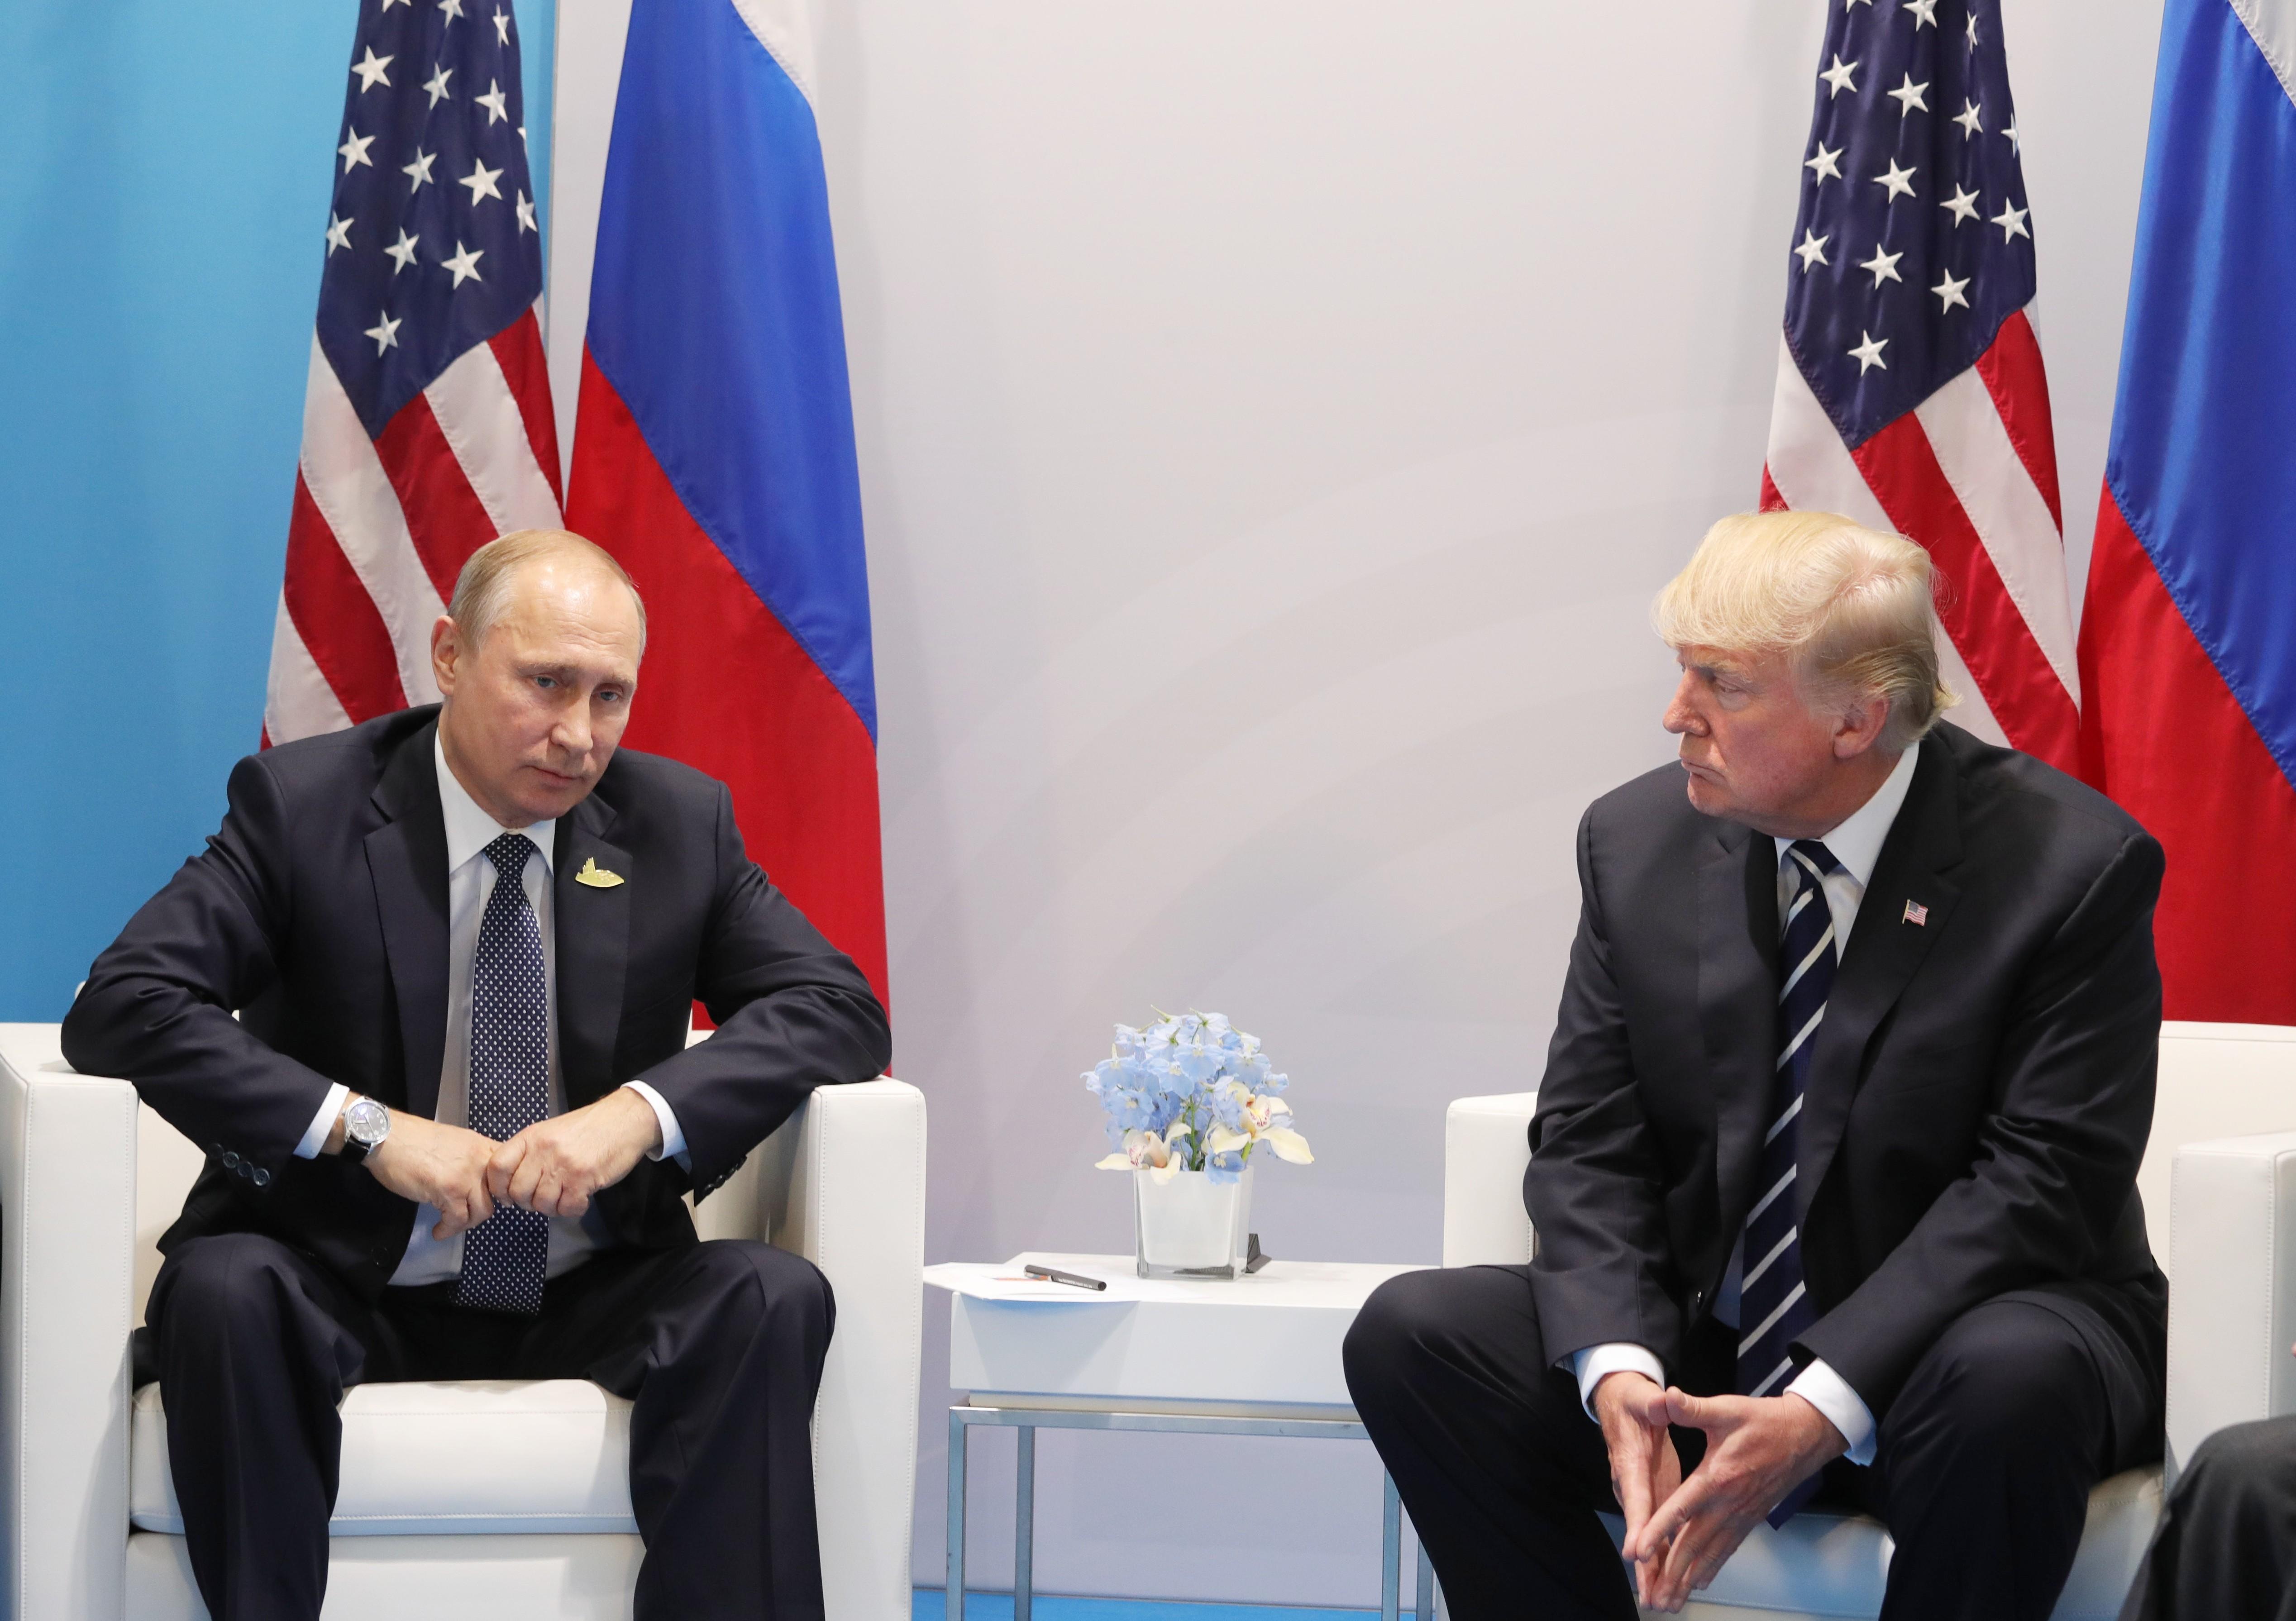 <p><span>Президент РФ Владимир Путин и президент США Дональд Трамп. Фото: &copy;РИА Новости/Михаил Климентьев</span></p>